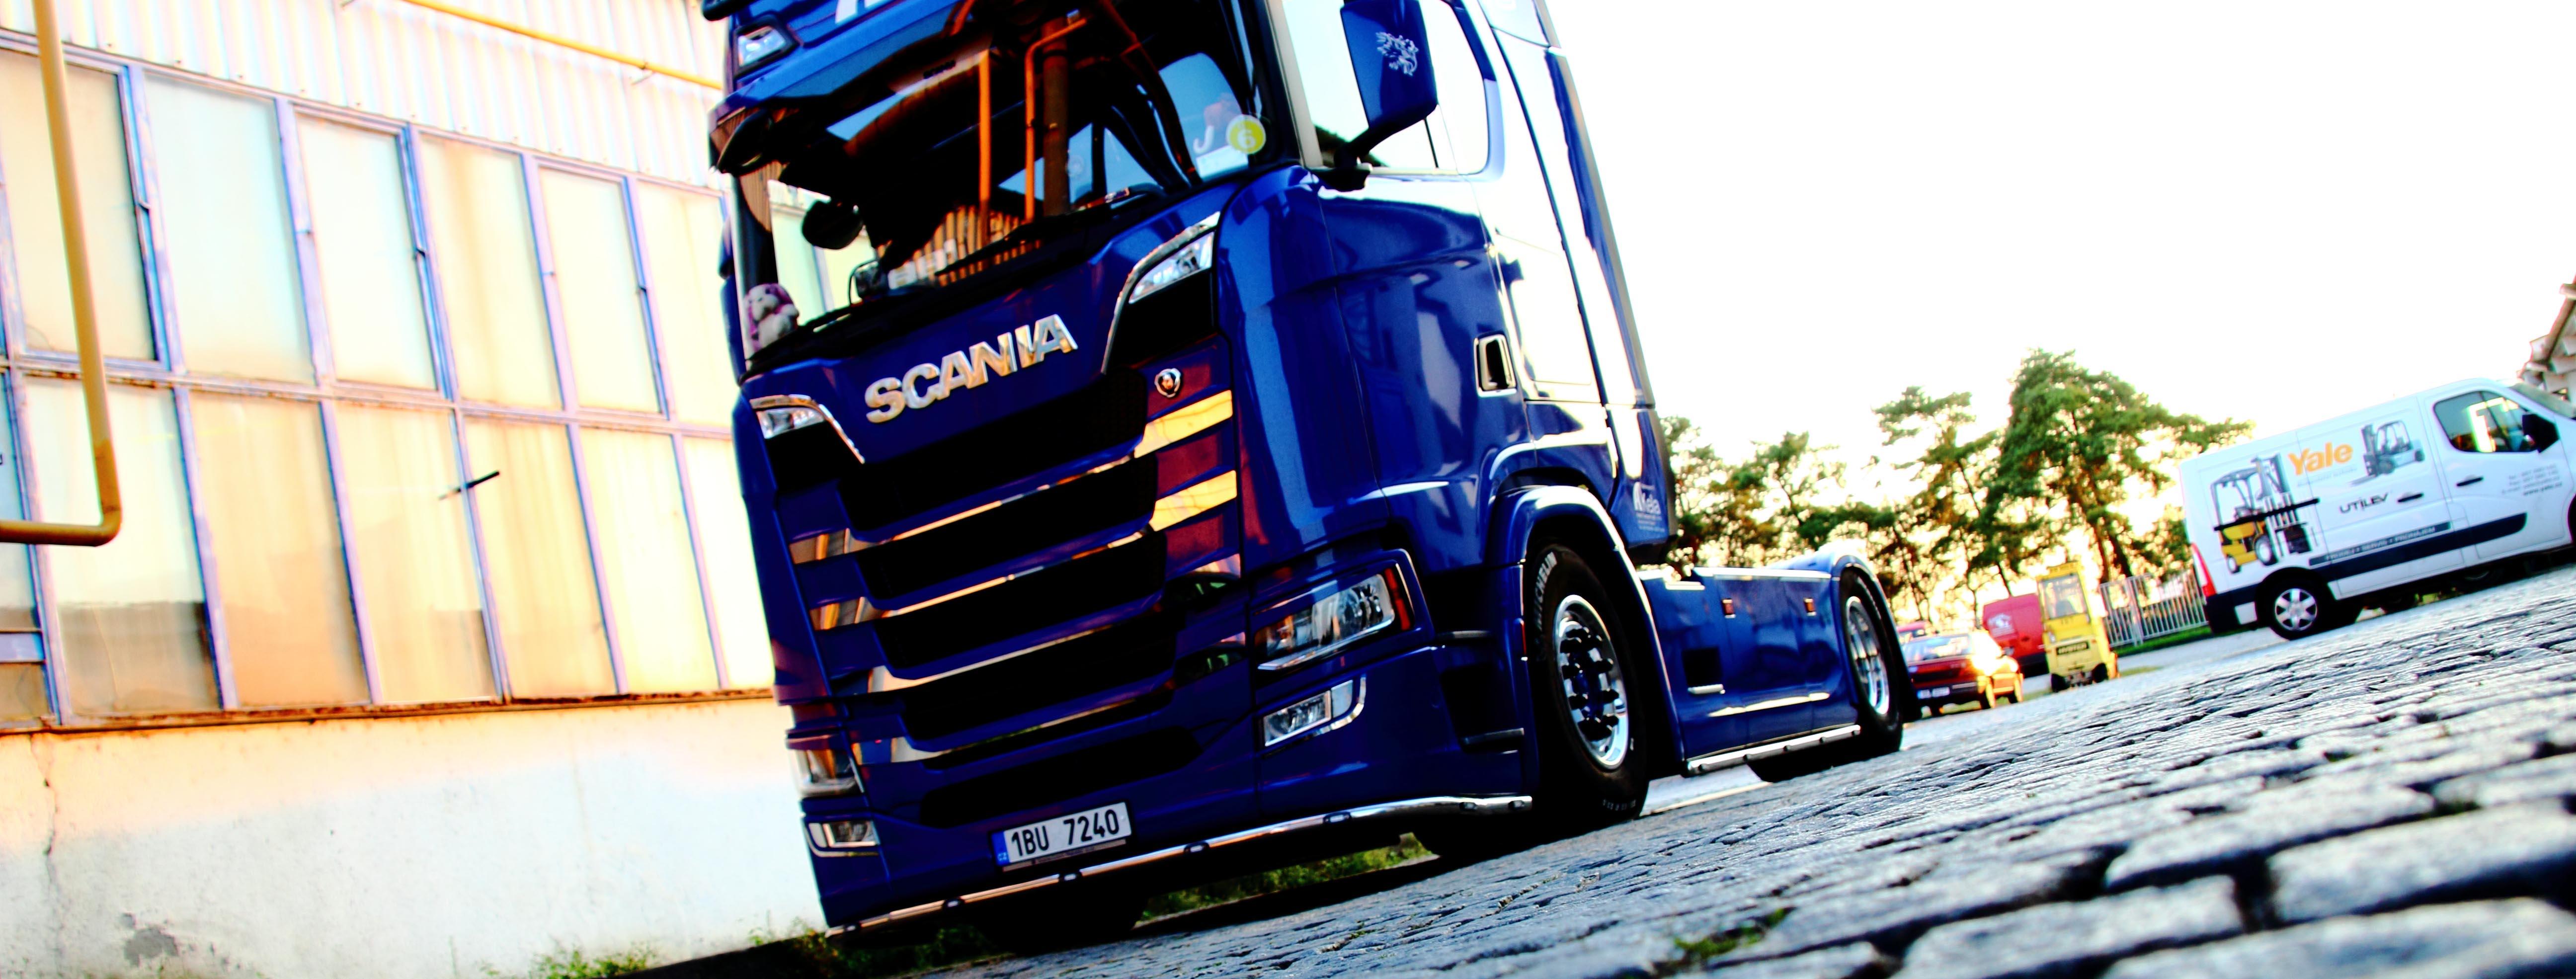 Scania next generation chrome parts